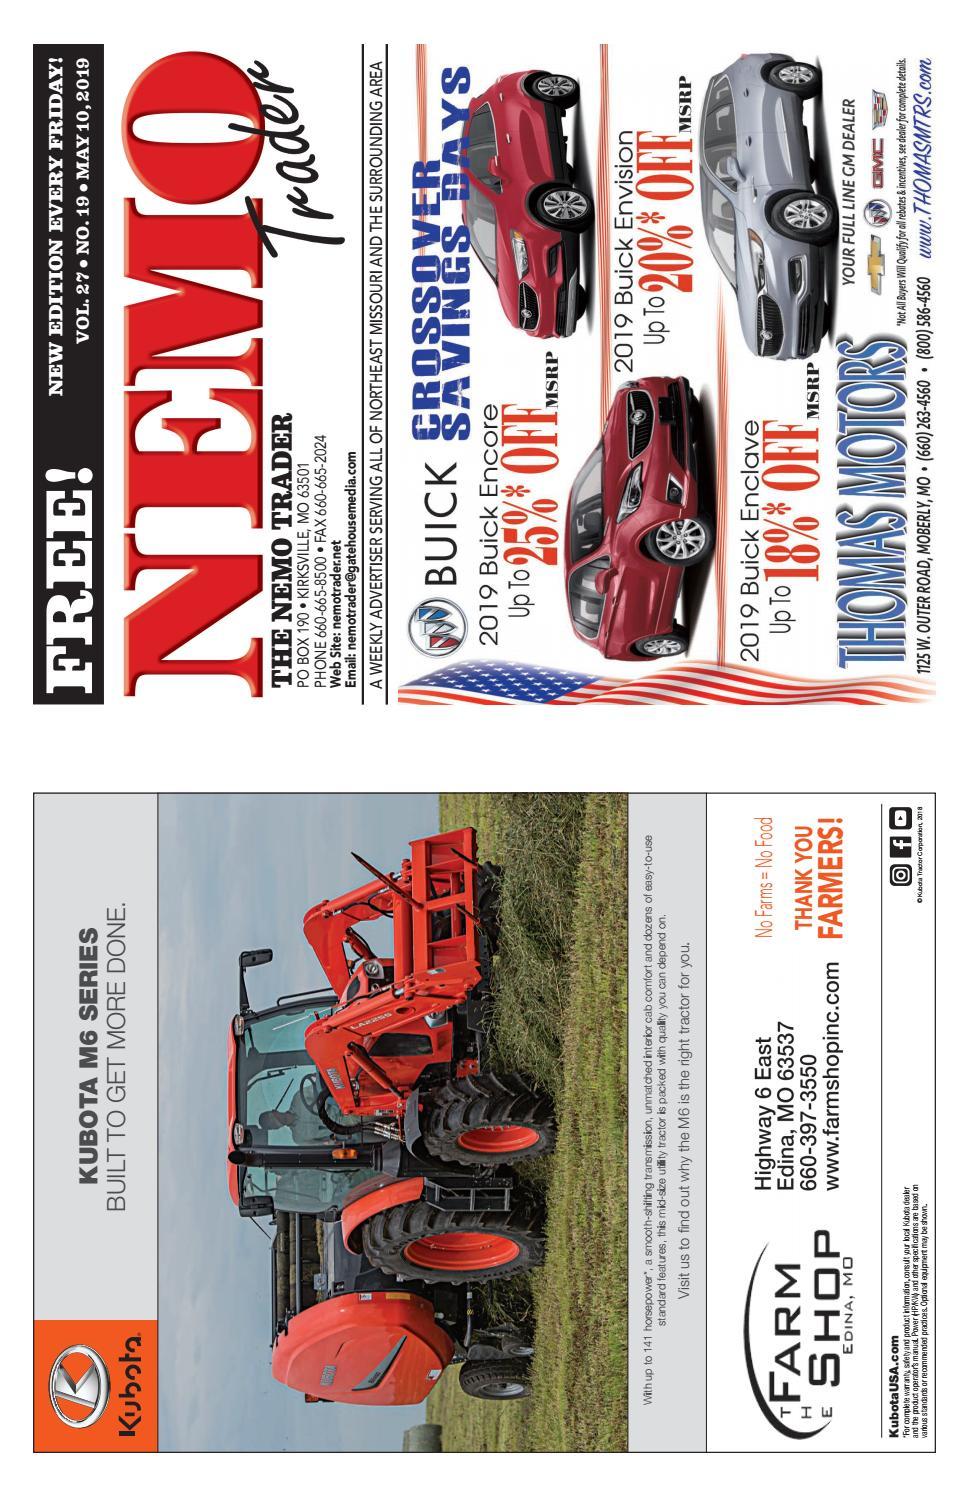 15a3366e65 NEMO Trader May 10th, 2019 by NEMO Trader - issuu